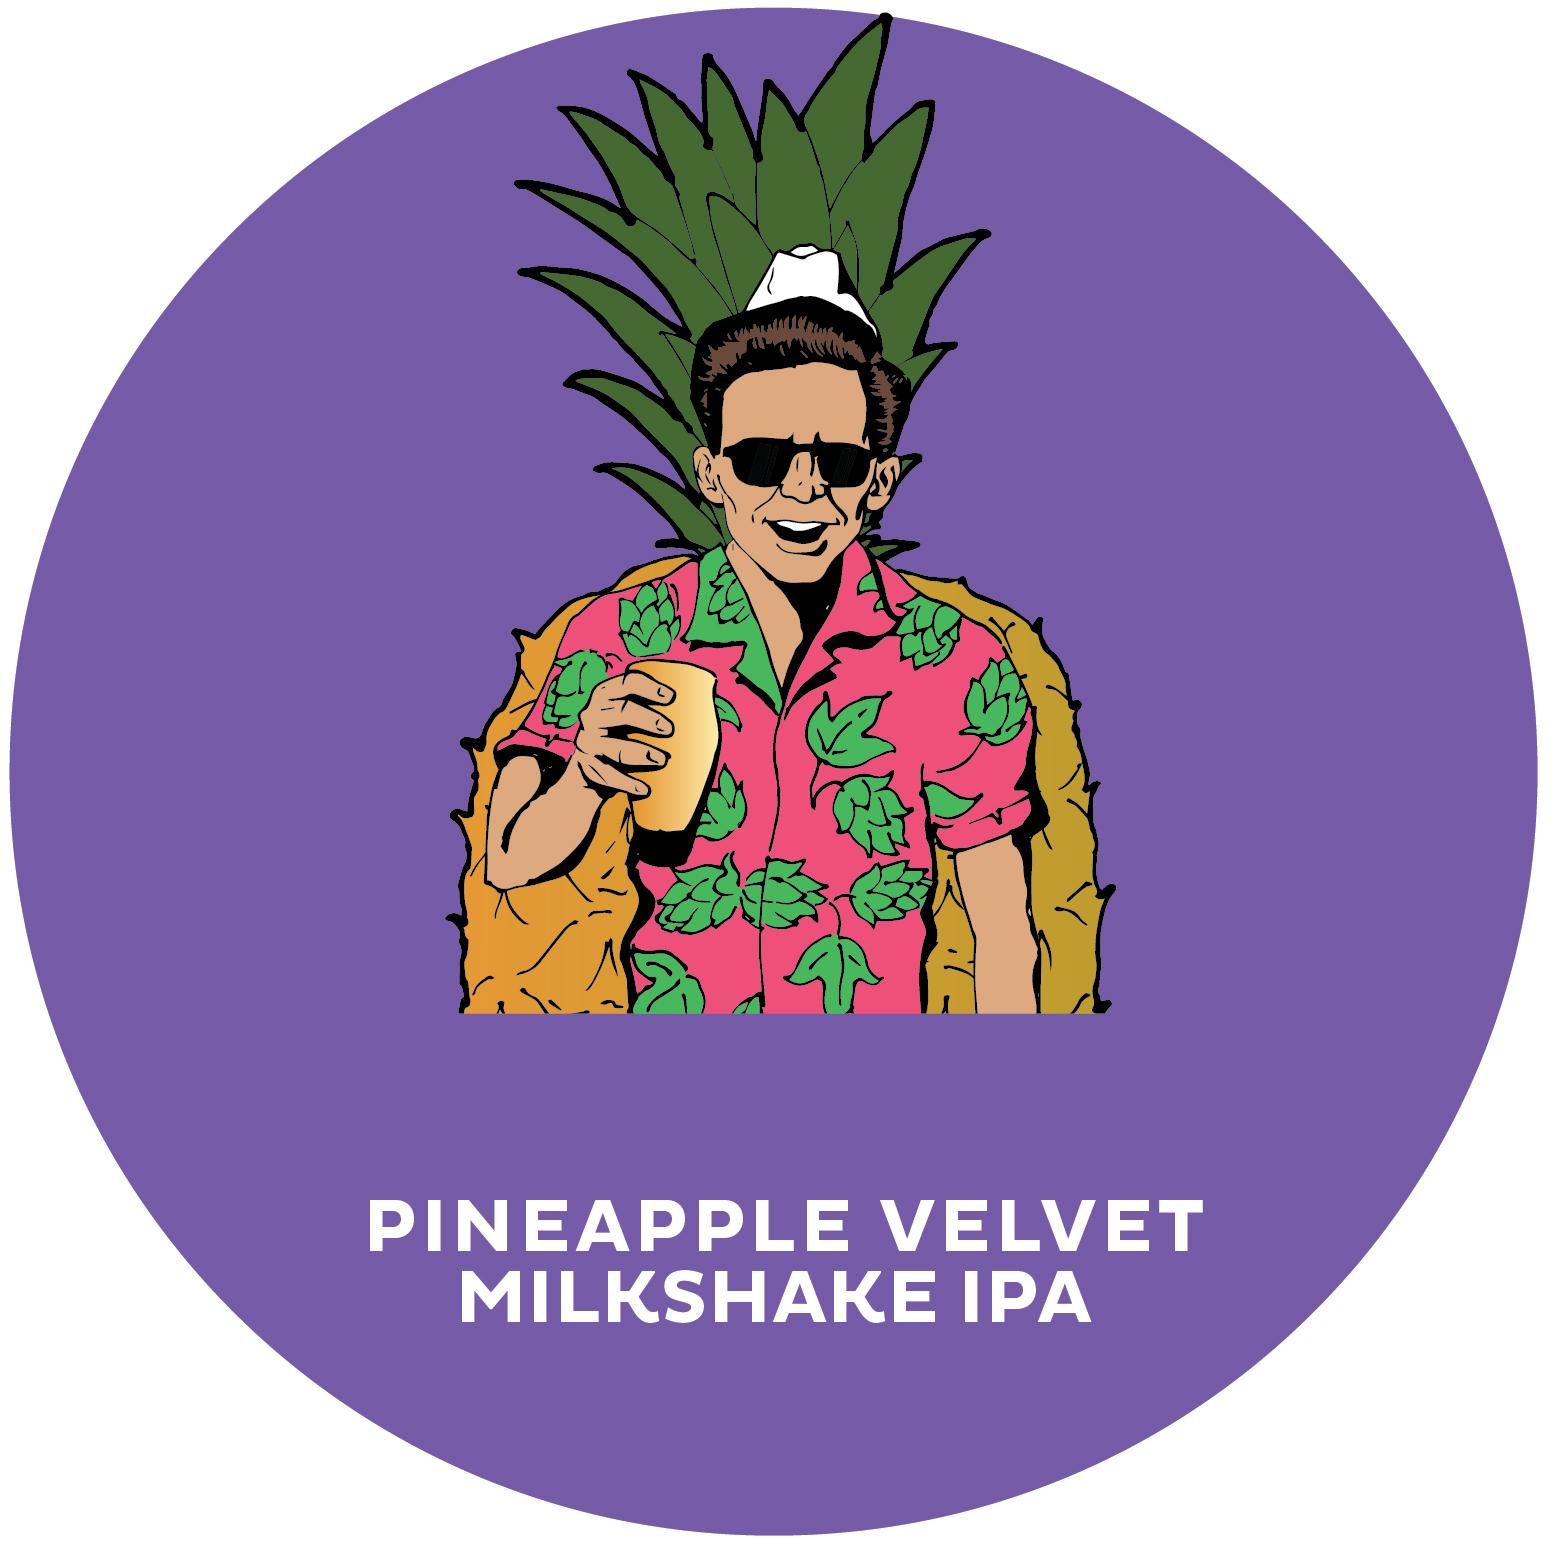 PineappleVelvetGraphic-01.jpg